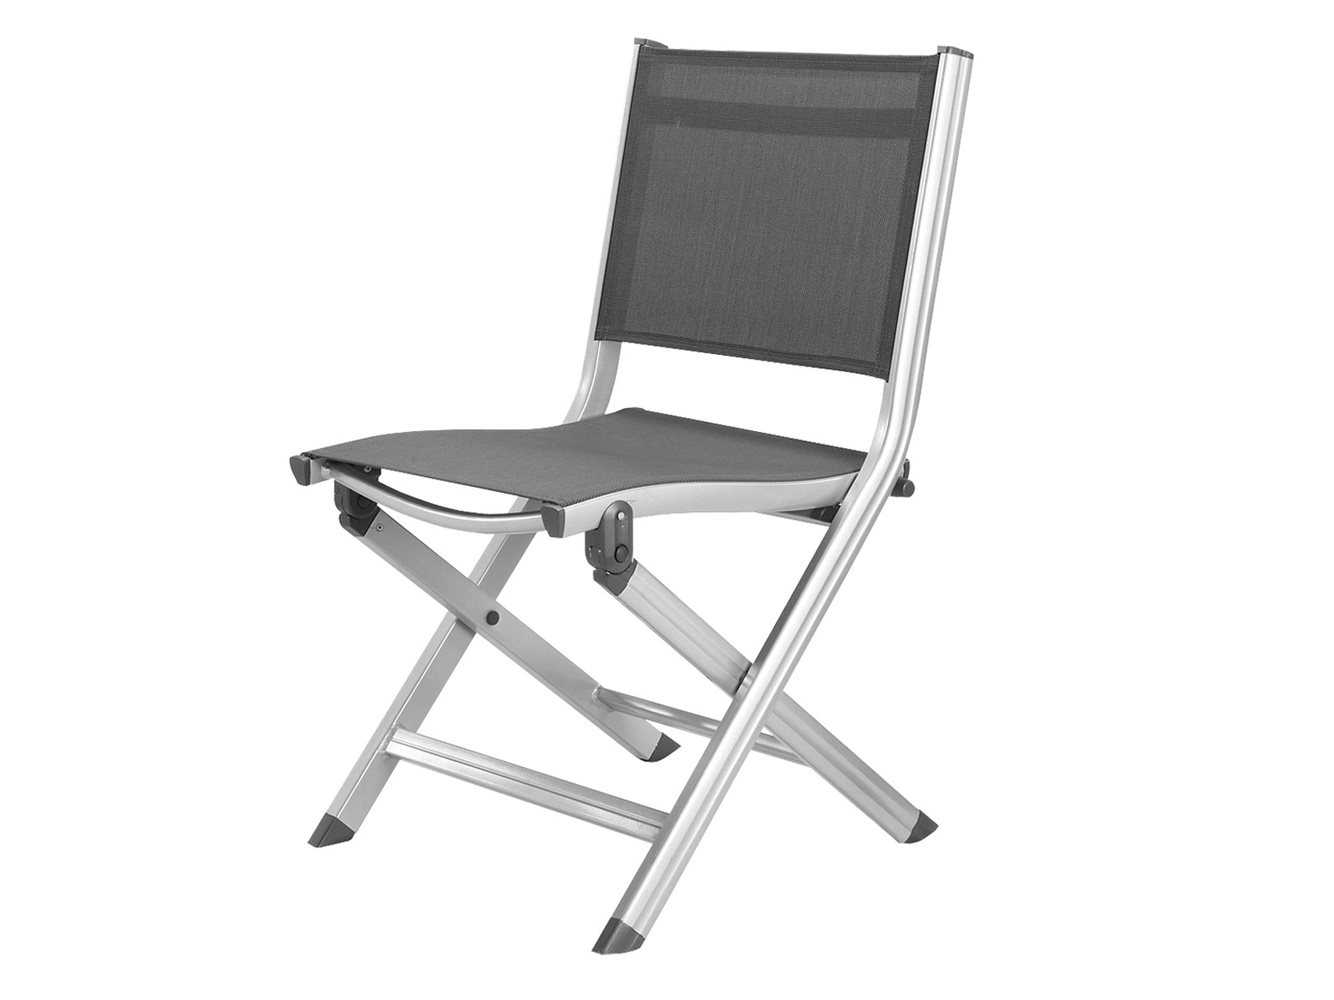 kettler basic plus aluminum lounge set basiclngeset. Black Bedroom Furniture Sets. Home Design Ideas